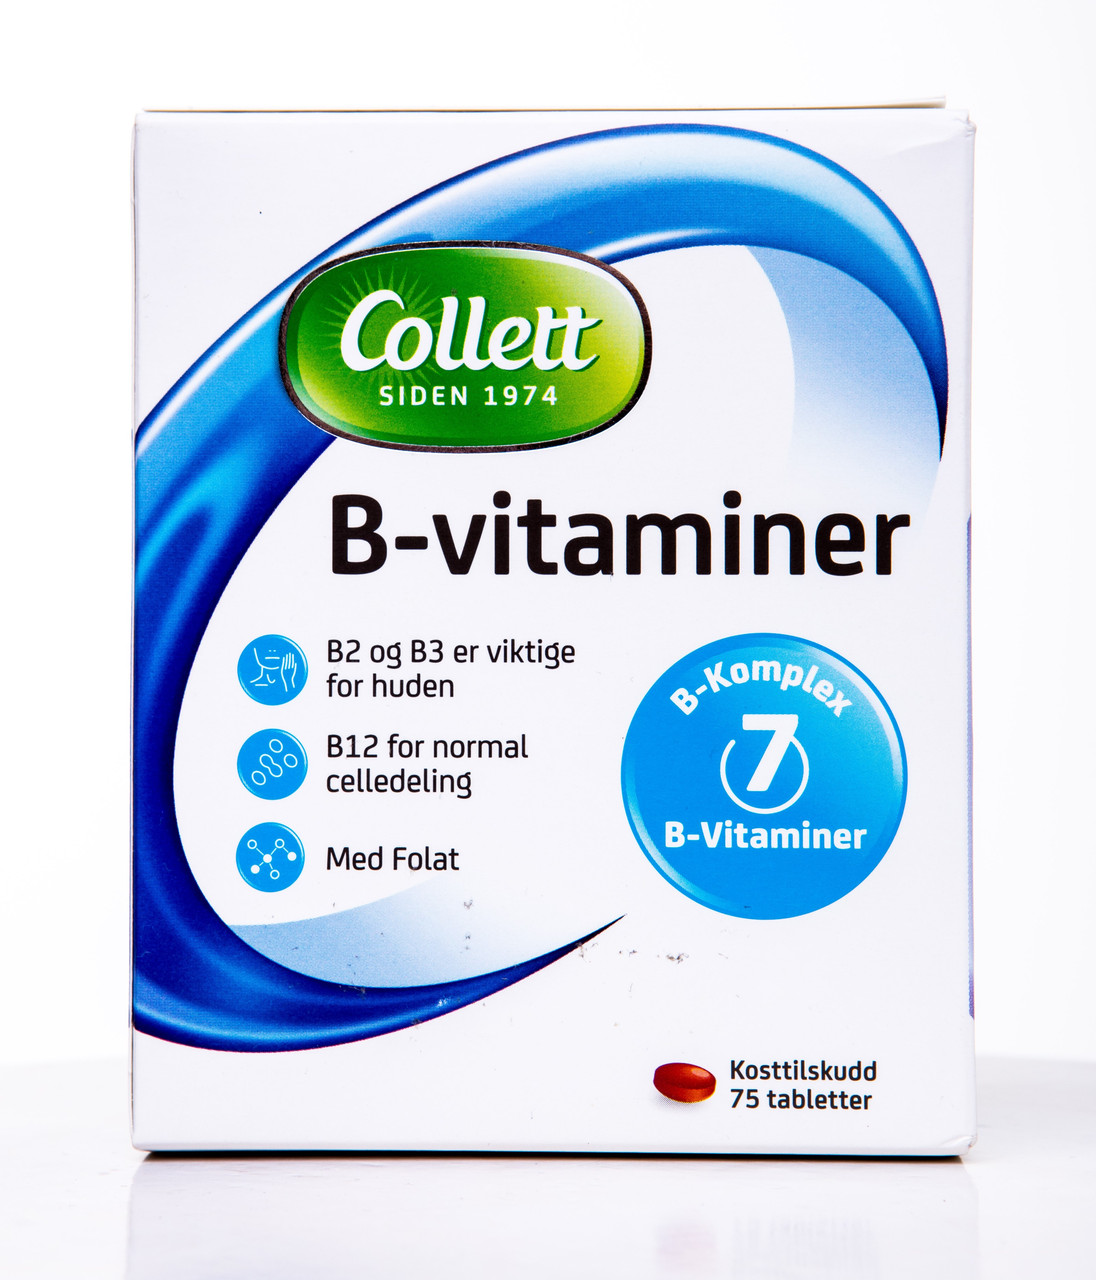 Витамин B2, B3, B12 (фолат),Collett, B-vitaminer, 75 таблеток, Норвегия